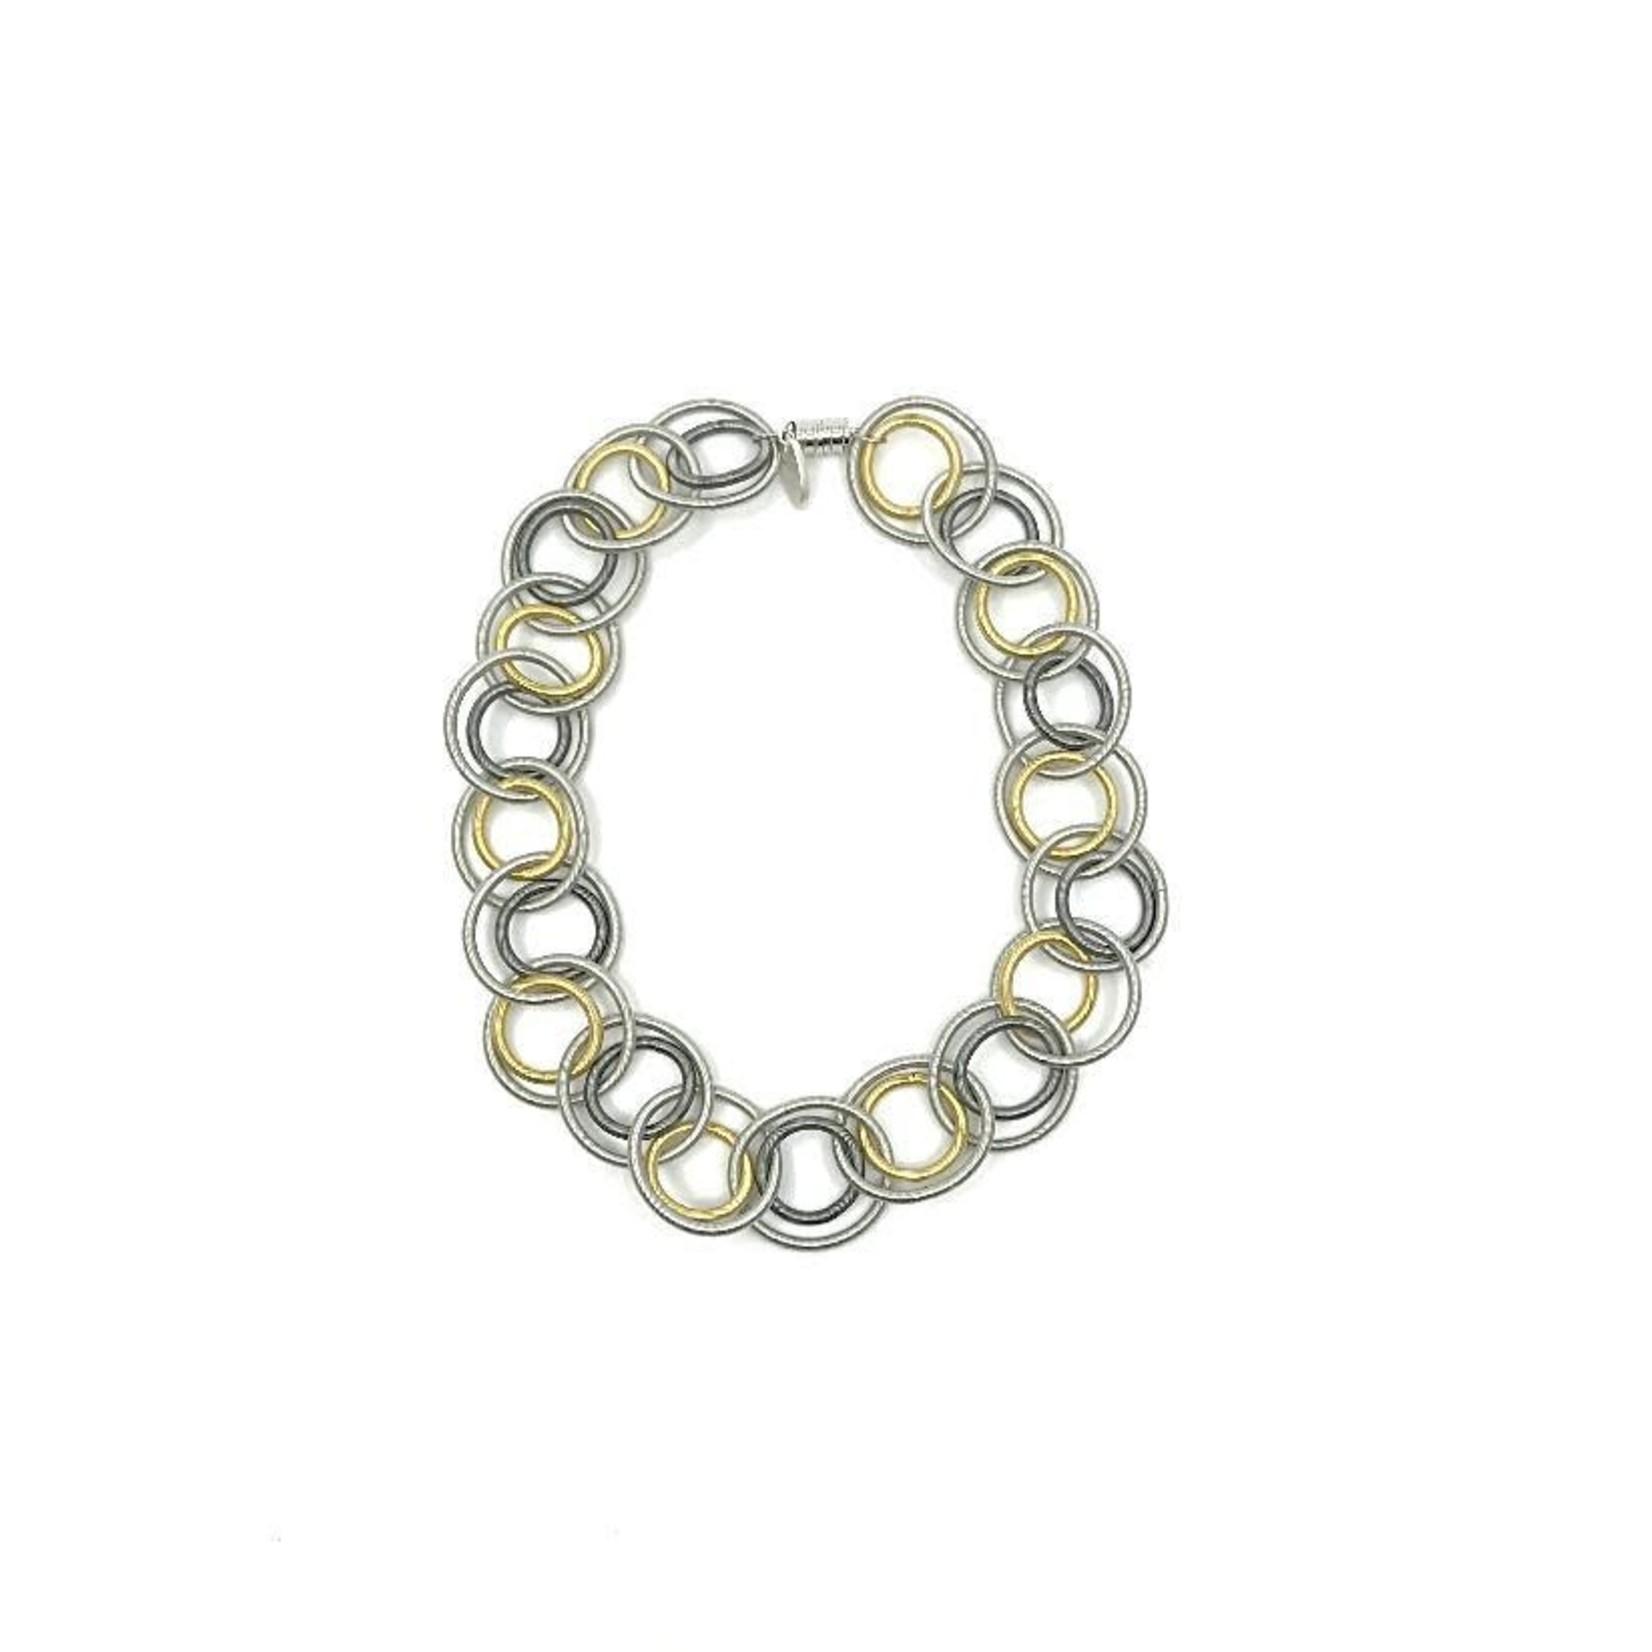 Sea Lily Multi Short Loop Necklace w/ Magnet Closure